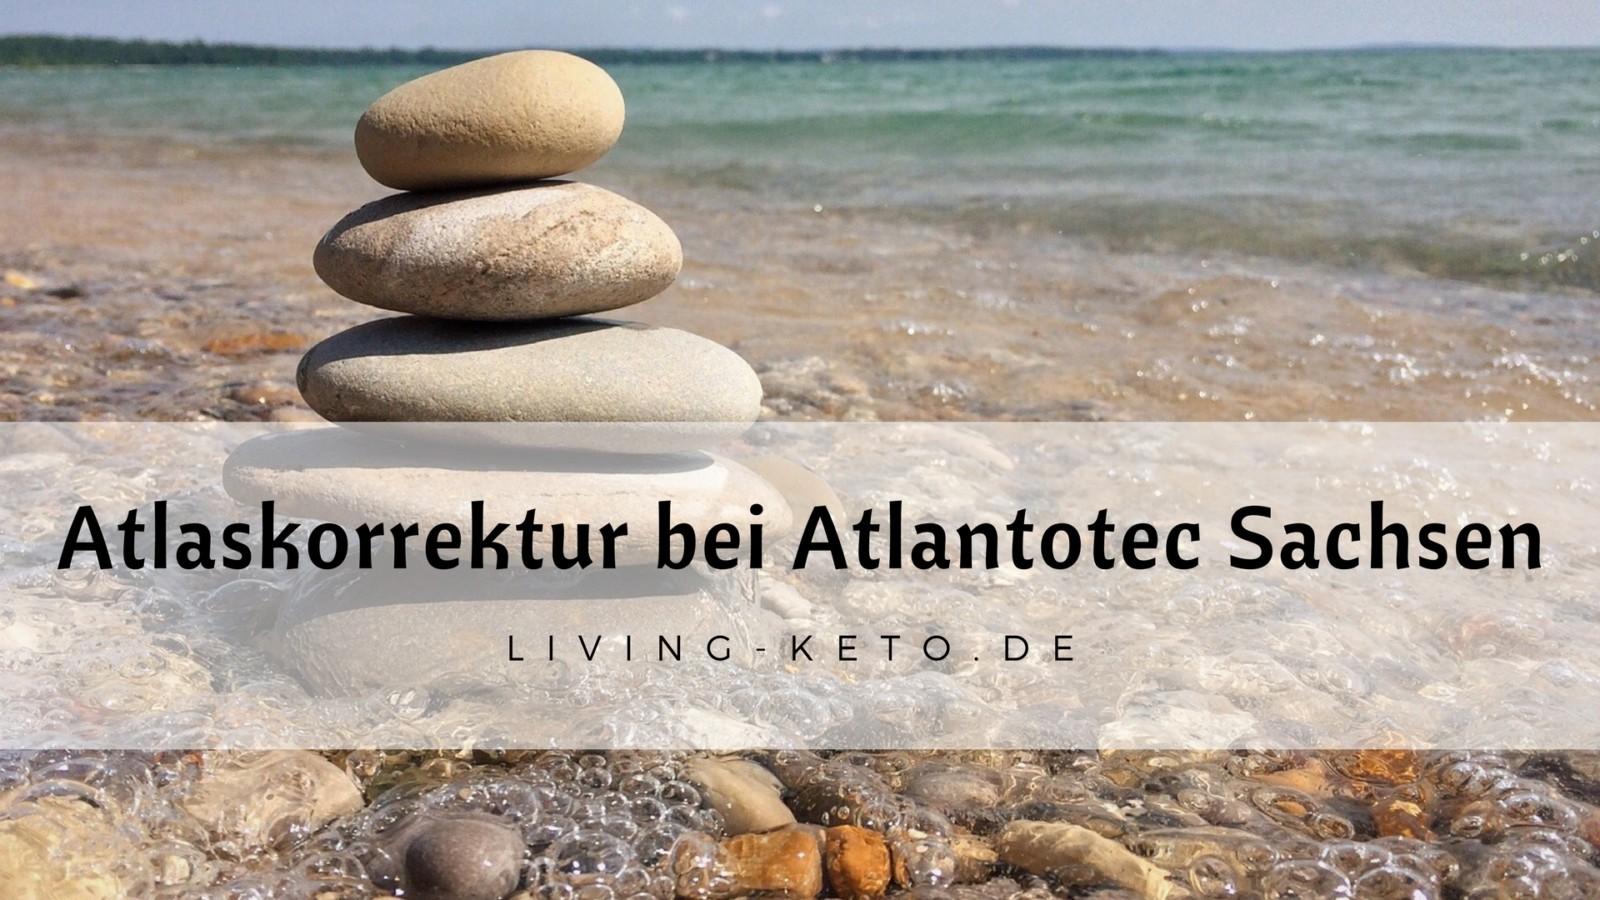 Atlaskorrektur bei Atlantomed Sachsen